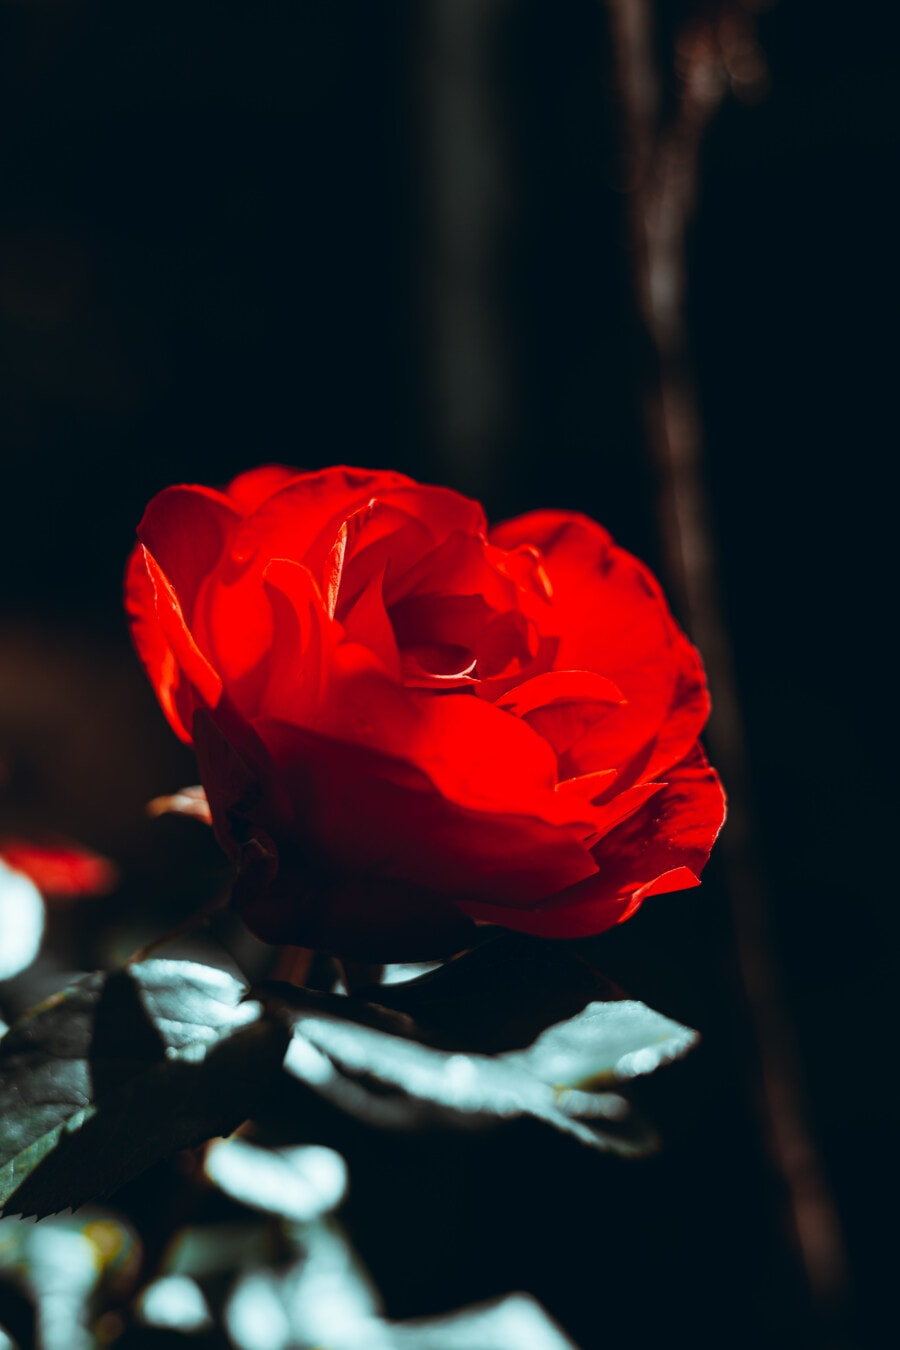 shadow, shrub, branchlet, bud, flower, camellia, petal, plant, rose, nature